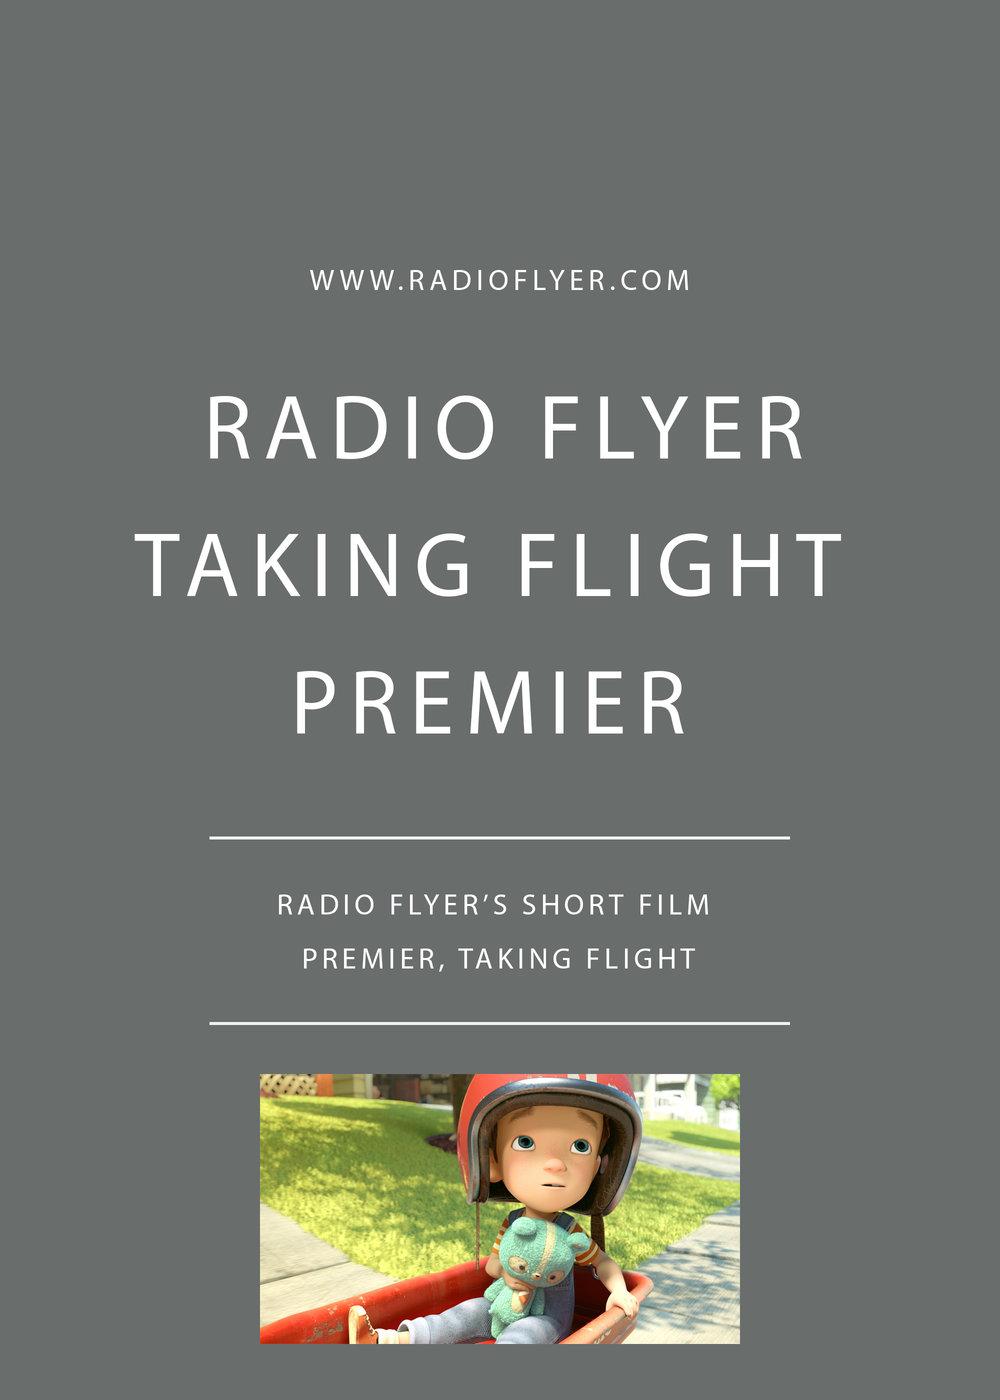 Radio Flyer's Short Film Premier, Taking Flight